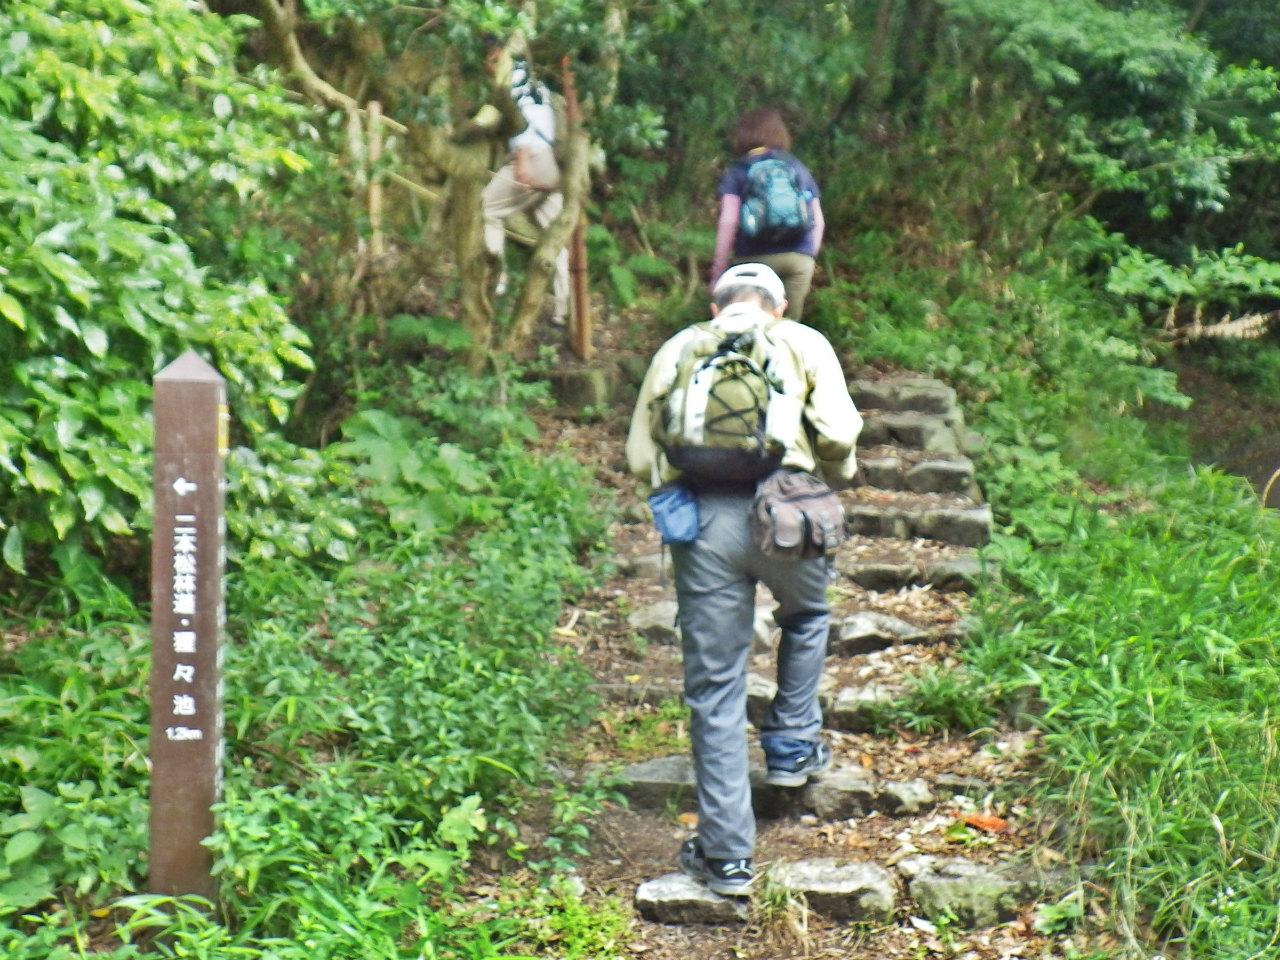 14b 再度山歩道へ進む